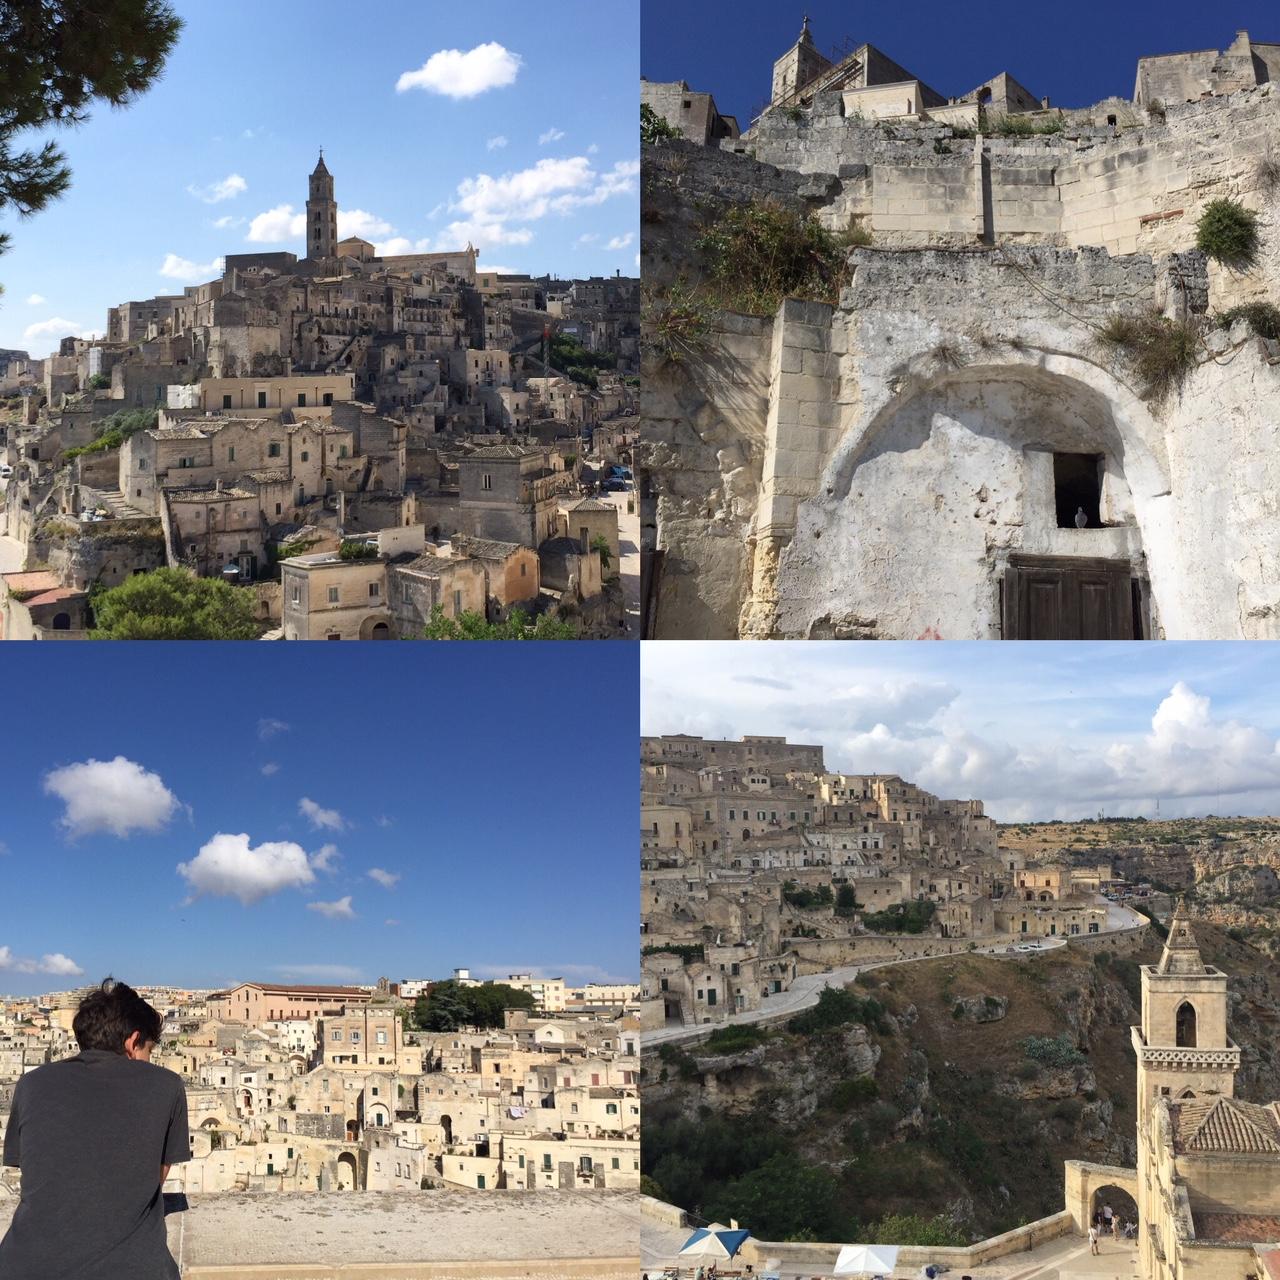 Matera (300 km from Pizzo)